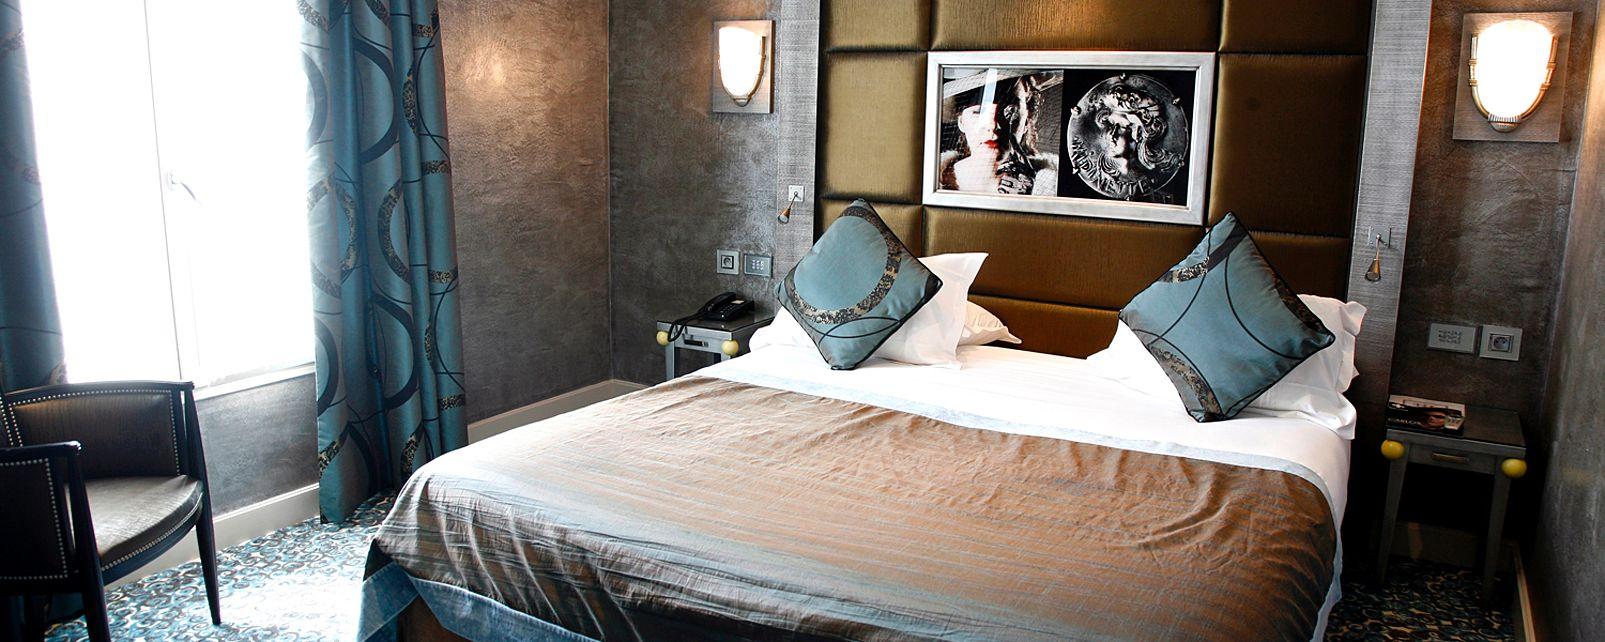 Hotel Des Champs Elysees Hotel Des Champs Elysaces Para S Francia